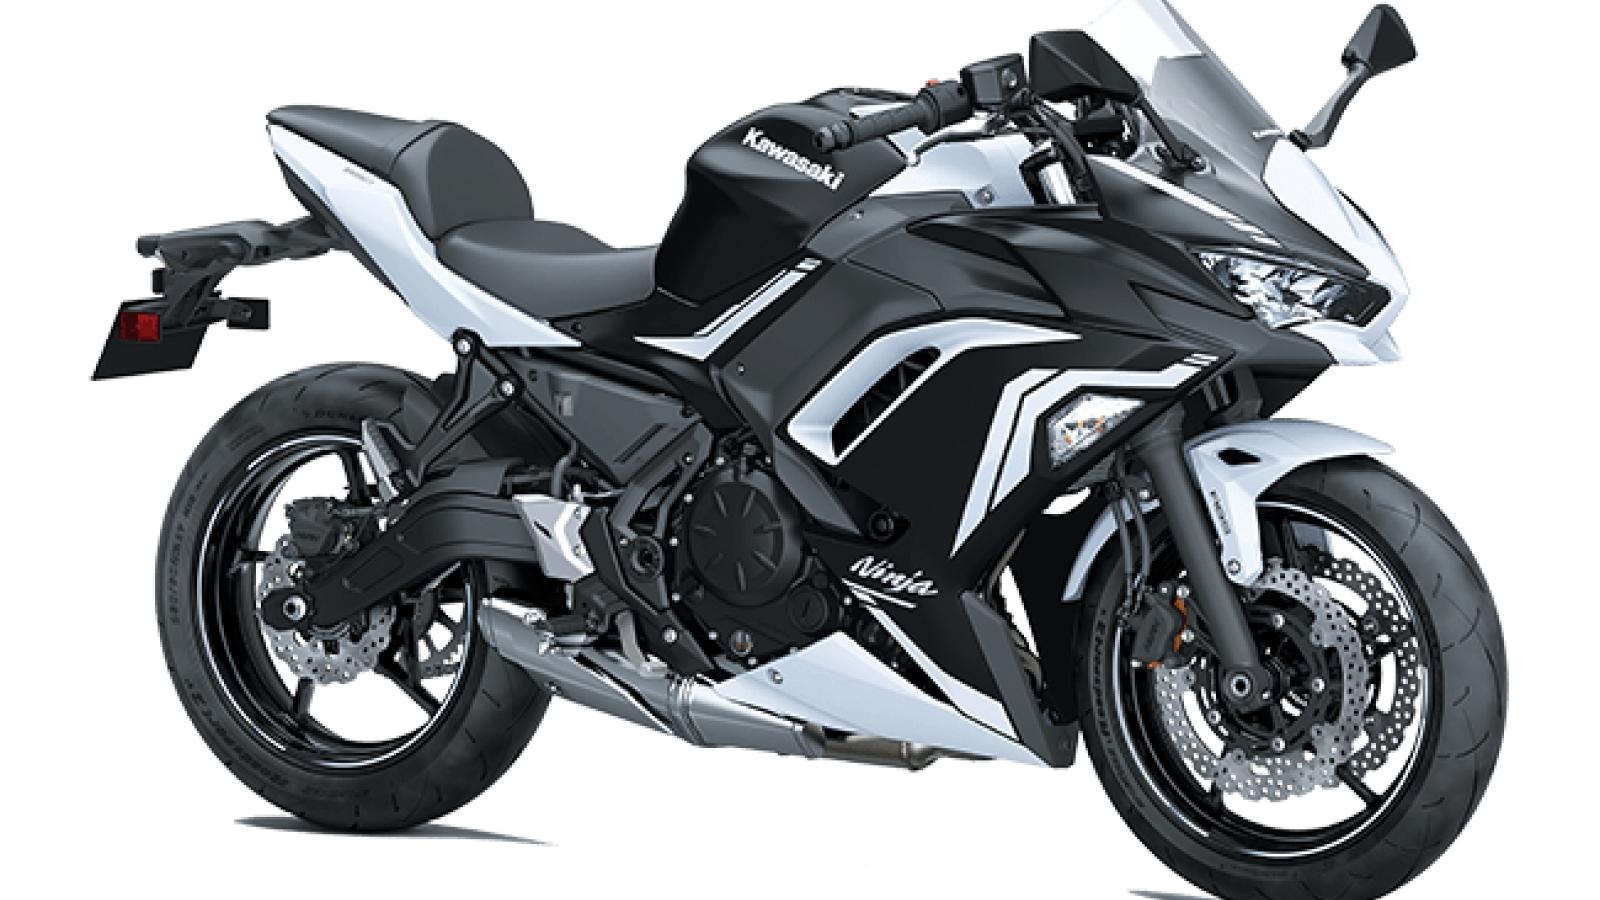 Kawasaki Ninja 650 2021 chốt giá từ 193 triệu đồng